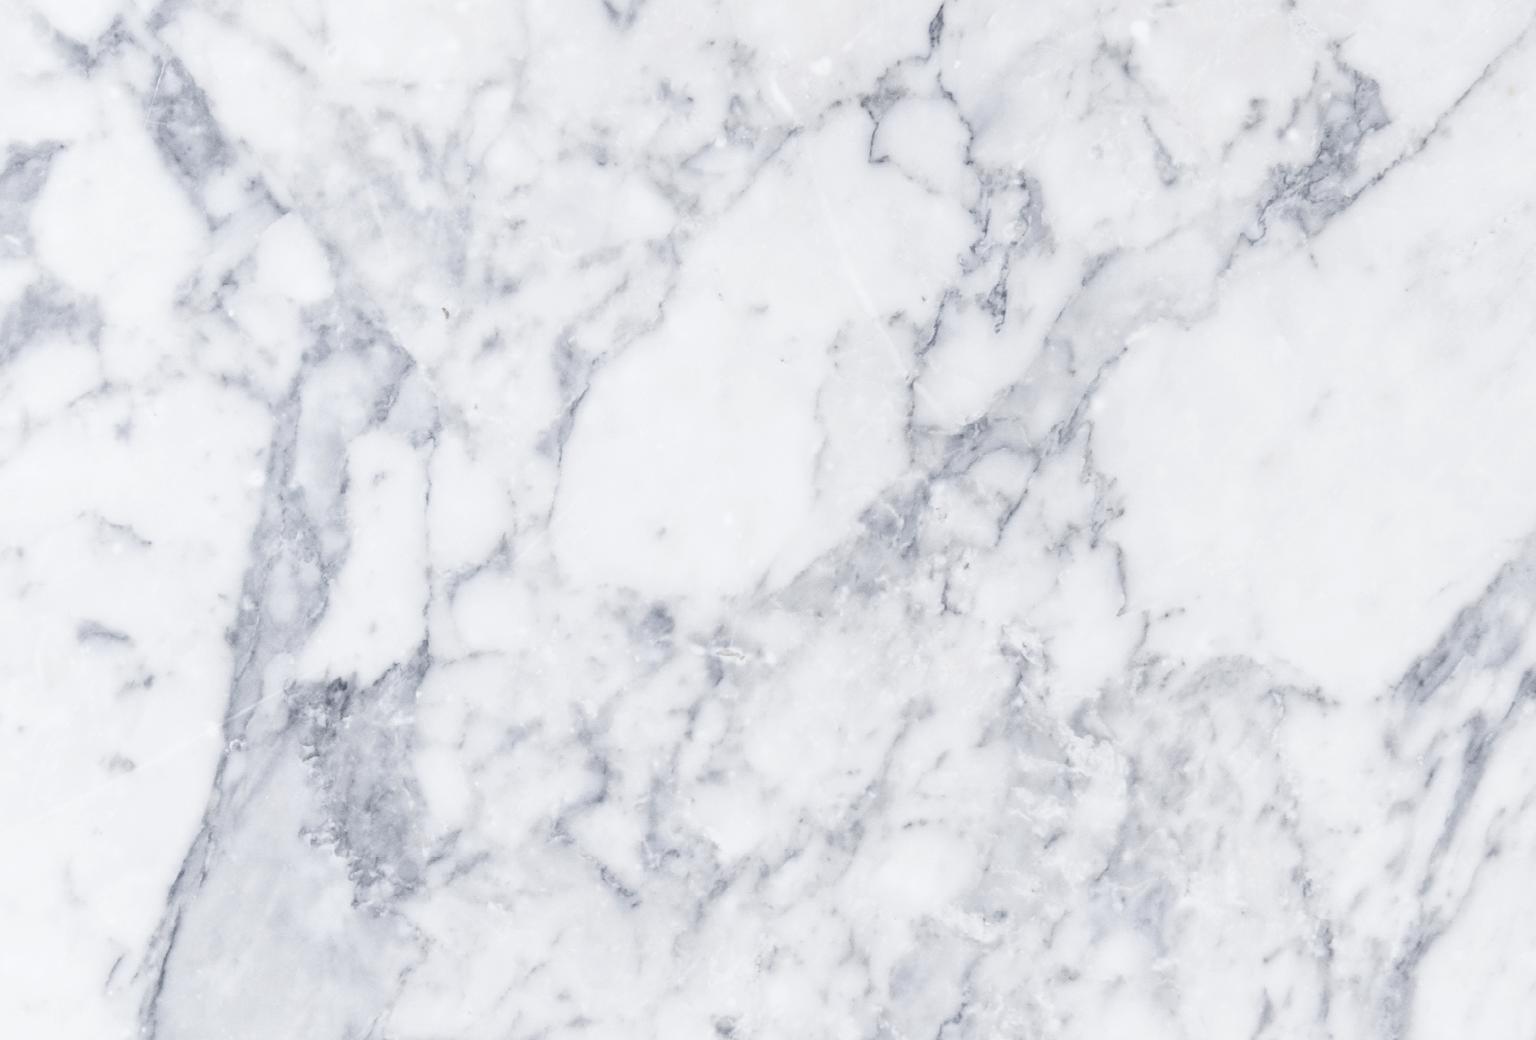 Granite Wallpaper Iphone Marble Wallpaper Hd Collection Pixelstalk Net